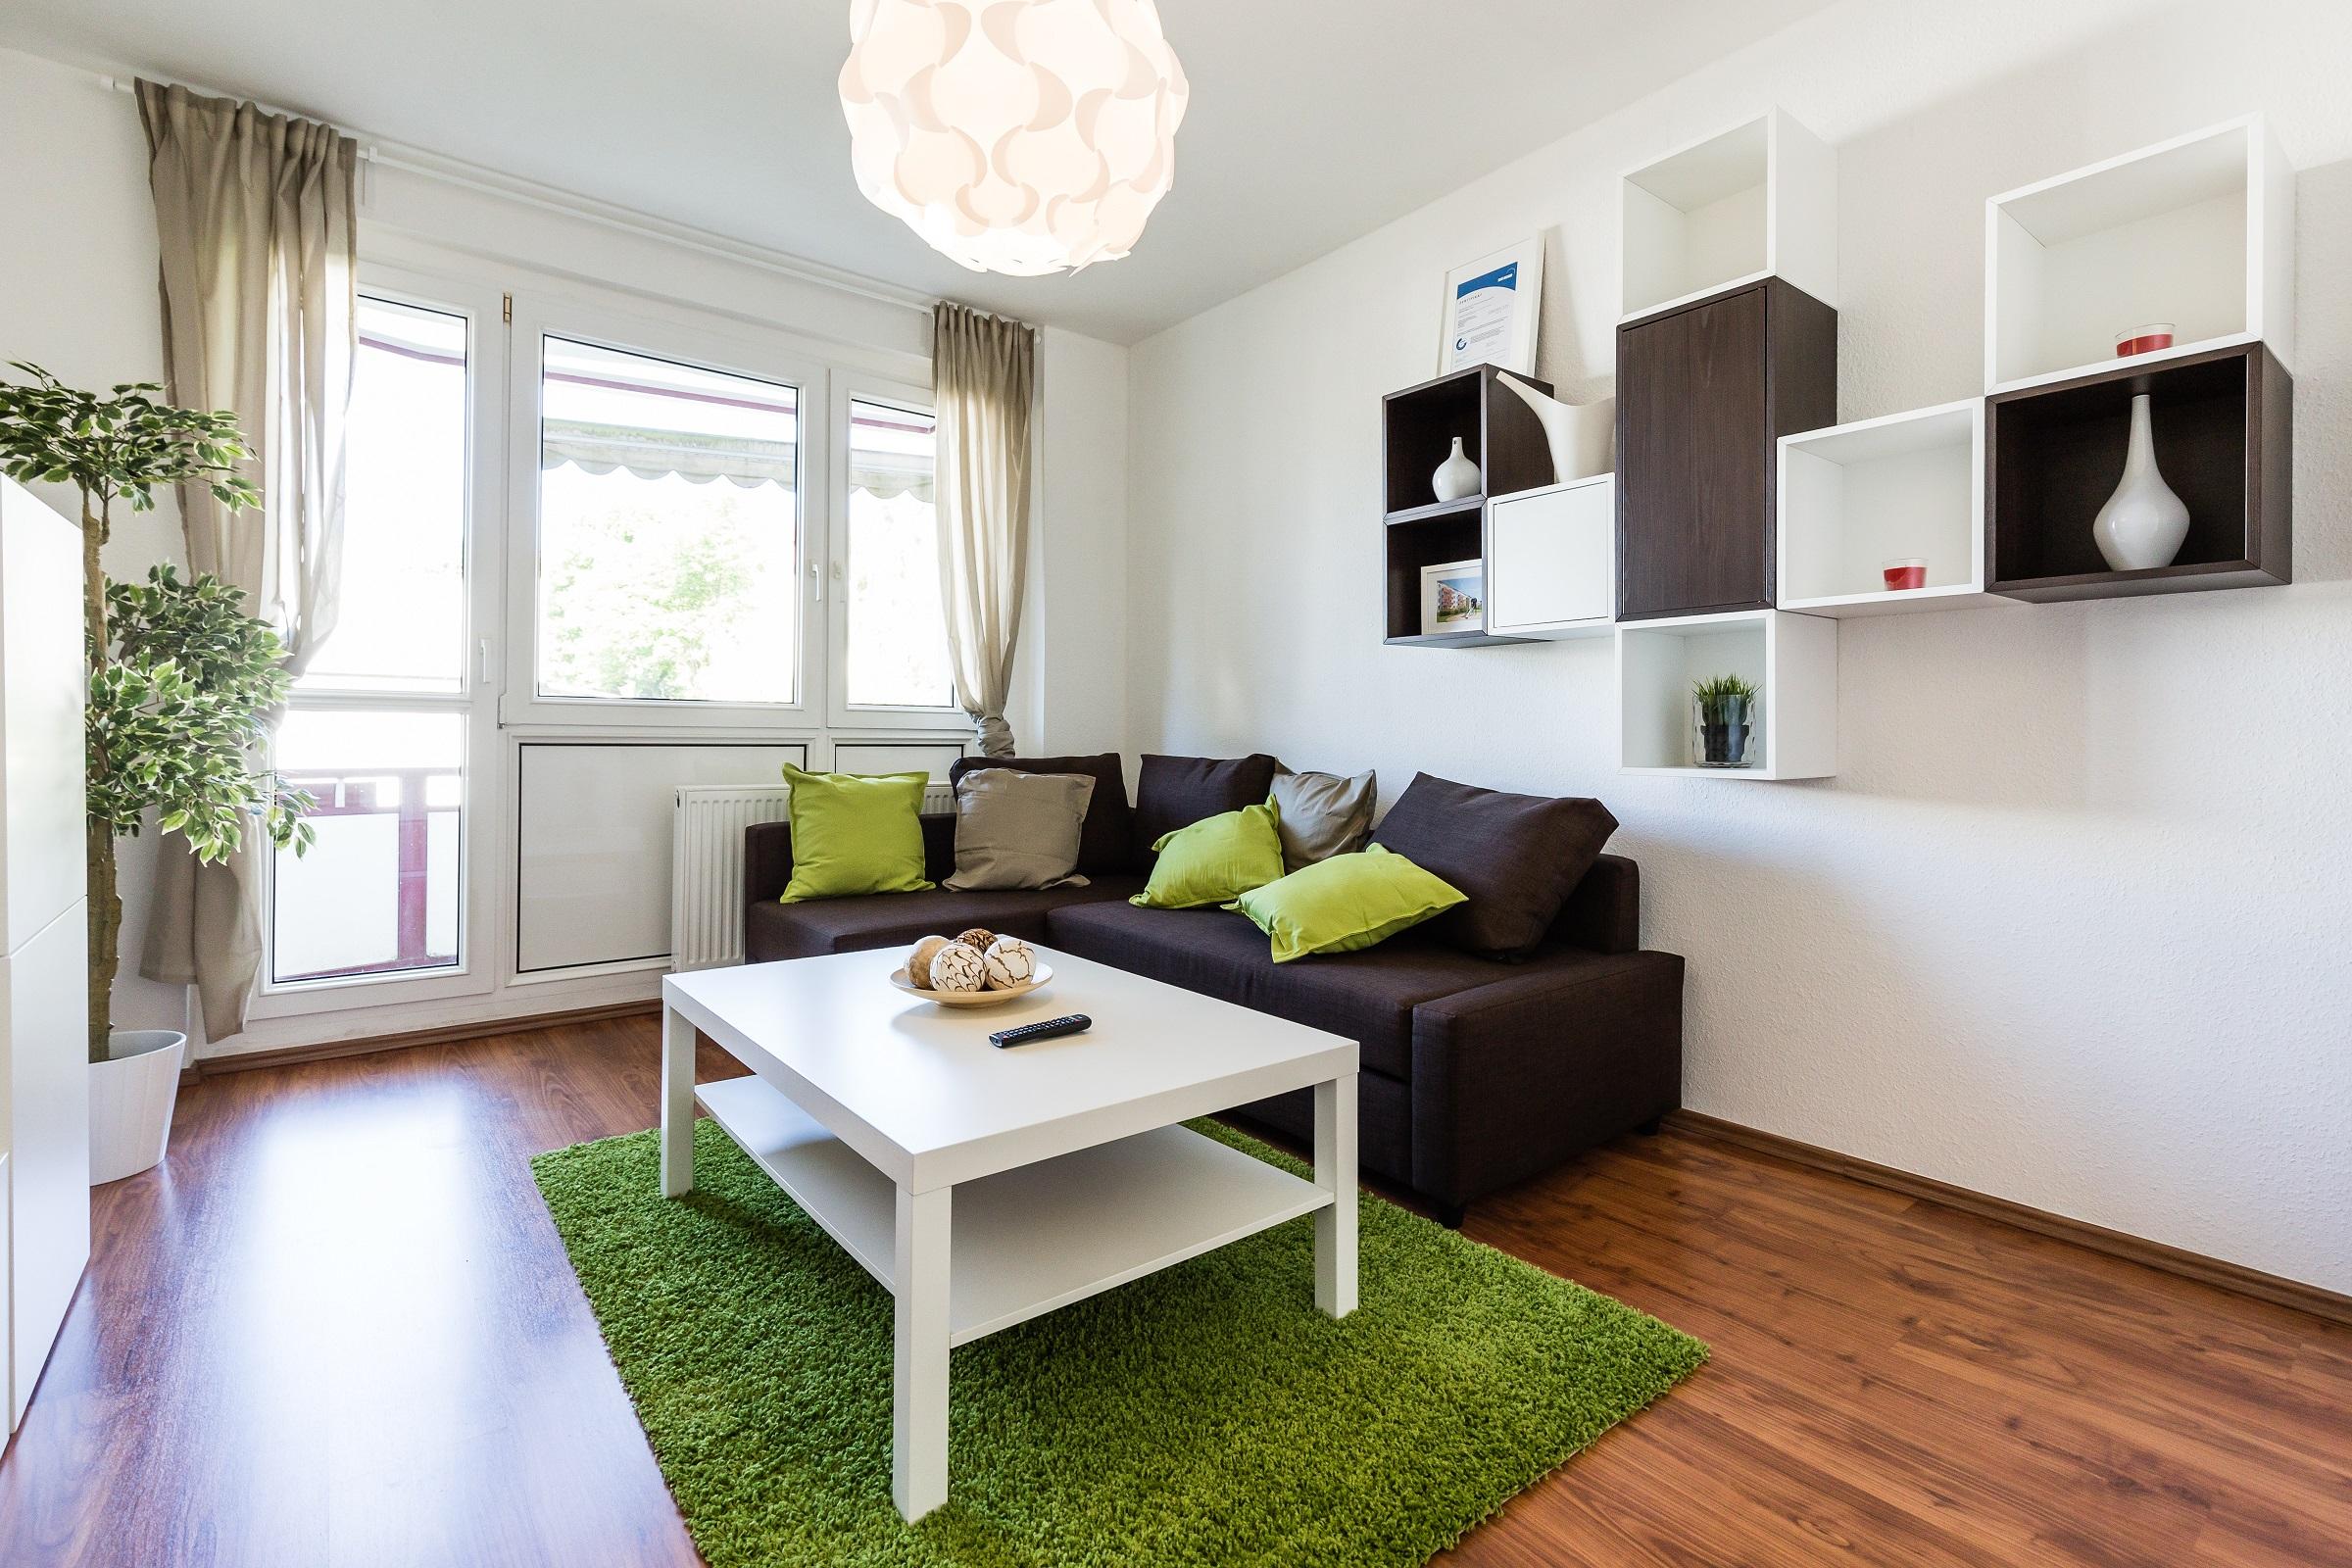 wohninspiration und tag der offenen t r in boizenburg grand city property gcp. Black Bedroom Furniture Sets. Home Design Ideas